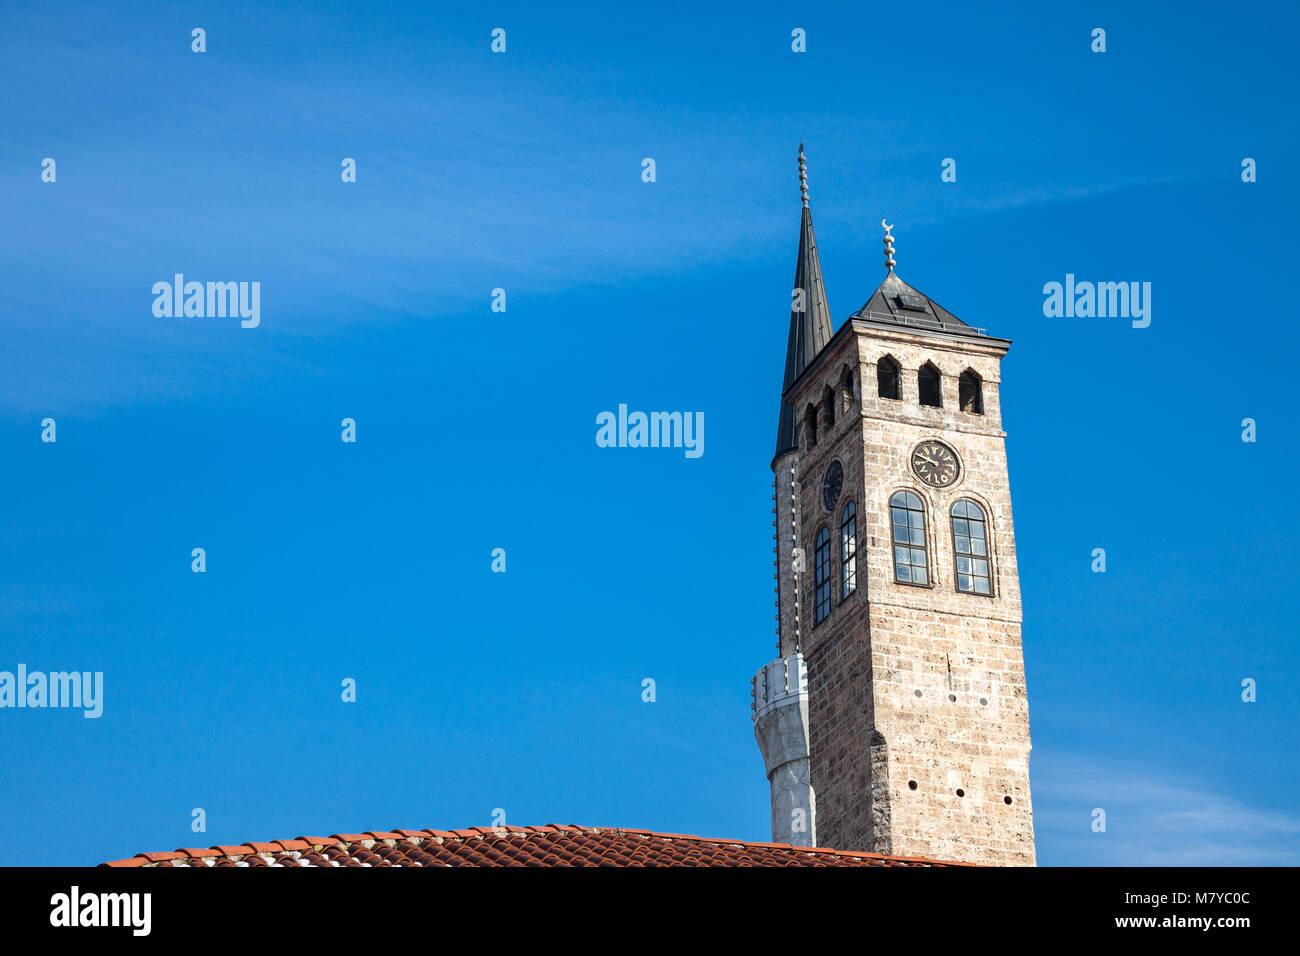 Minaret of the Gazi Husrev begova Mosque next to the clocktower of Sarajevo bazaar, in Bosnia and Herzegovina   - Stock Image